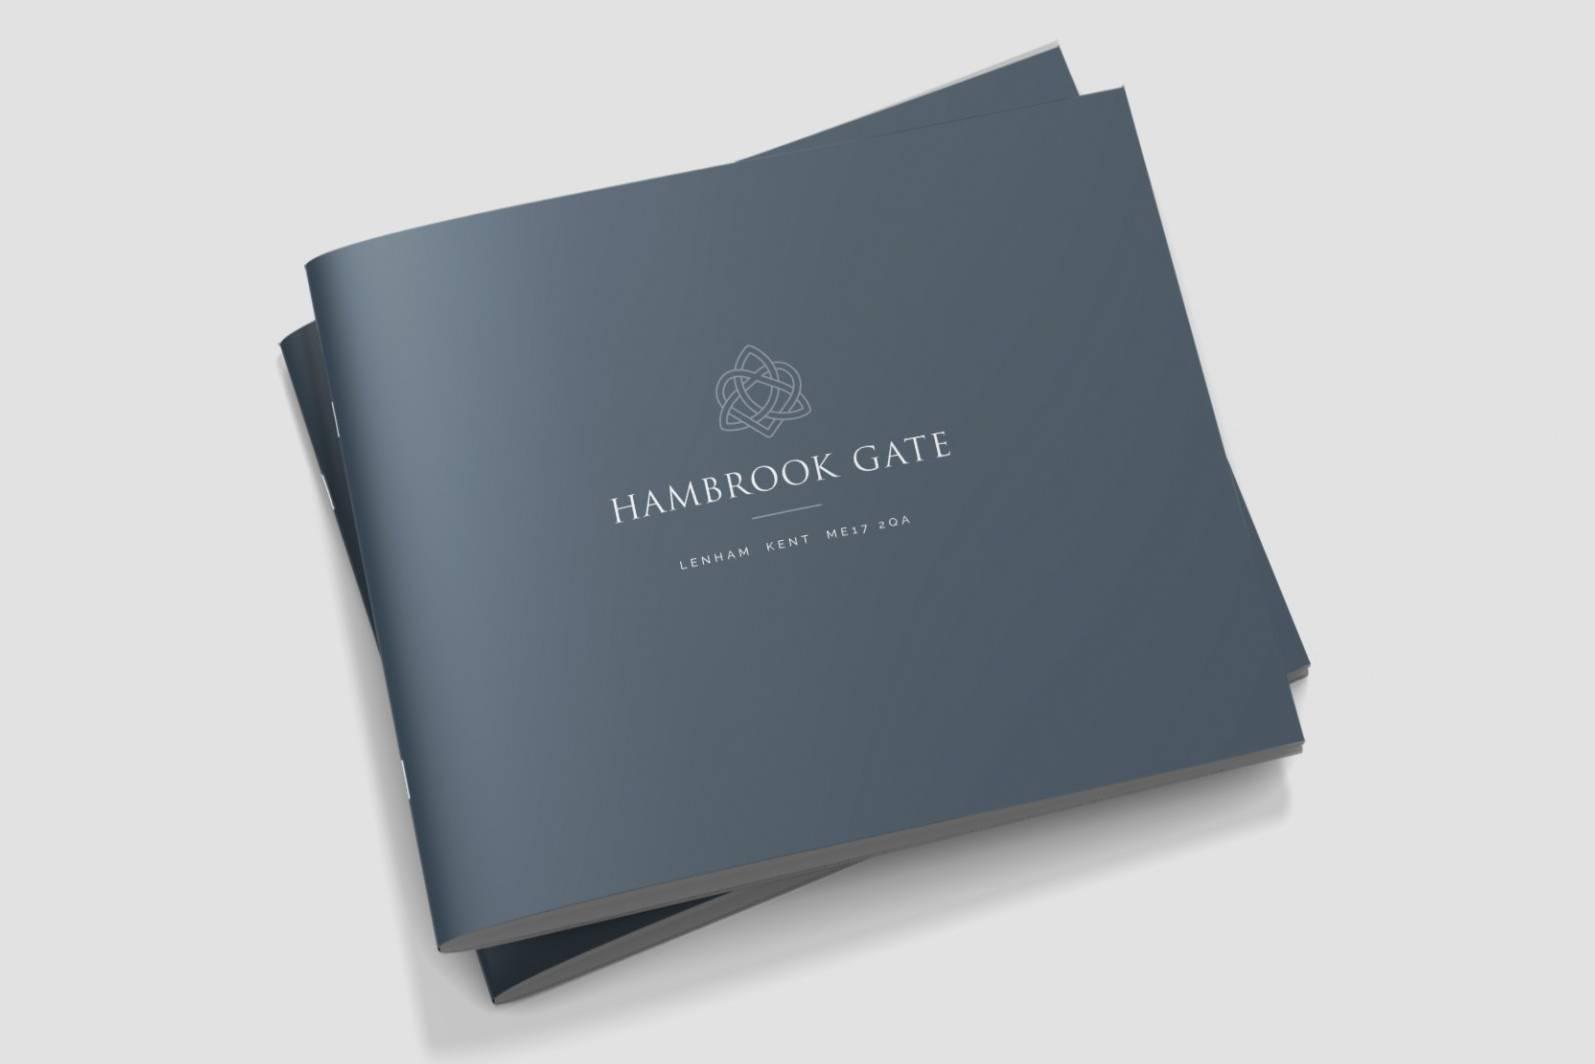 hambrook gate 002